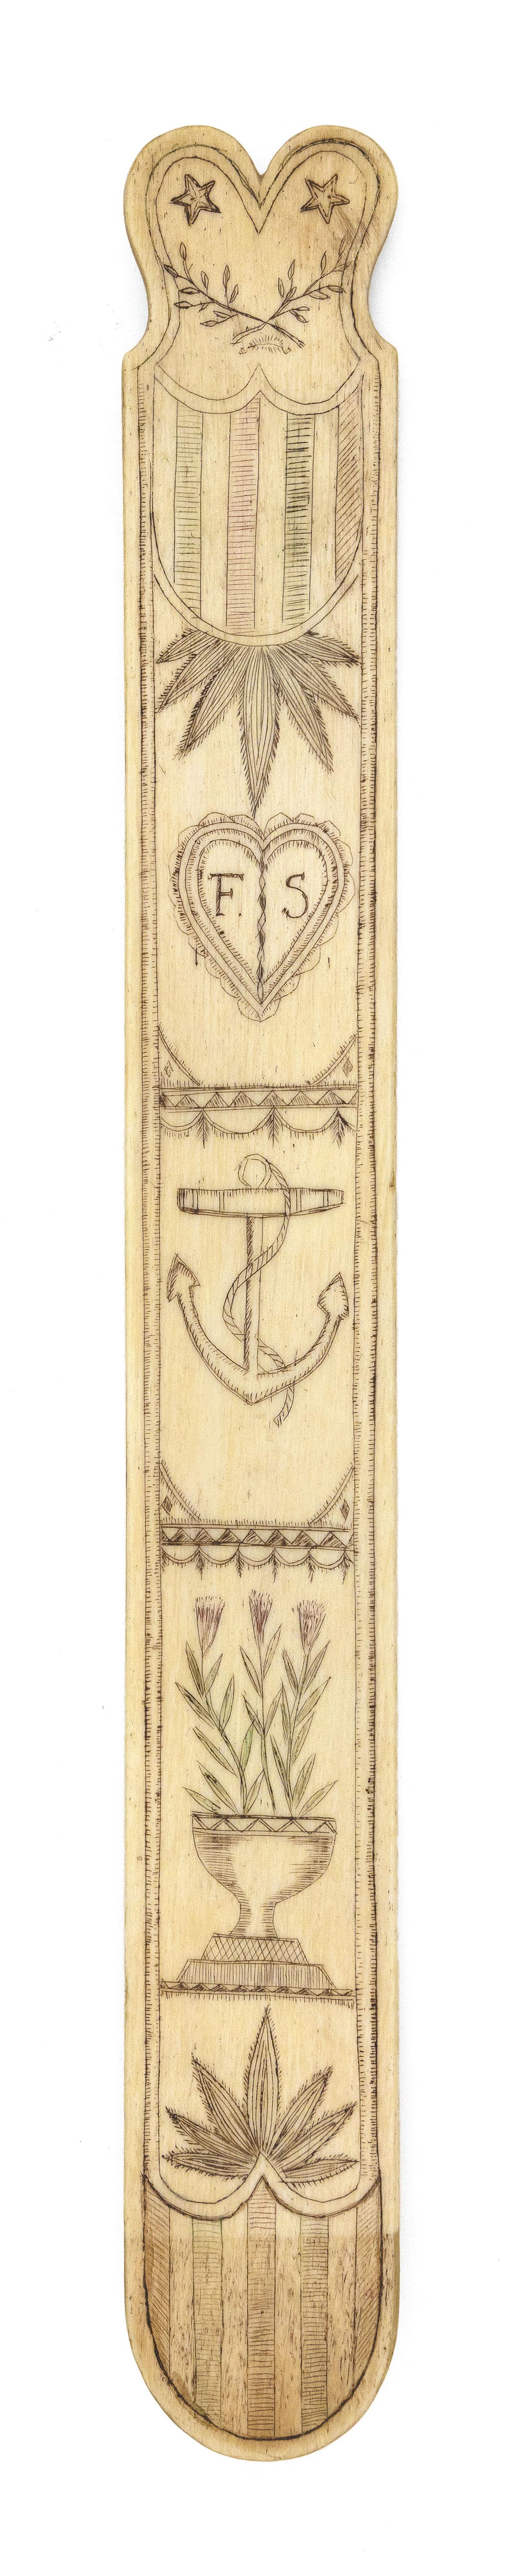 POLYCHROME SCRIMSHAW WHALEBONE BUSK Mid-19th Century Length 13.25